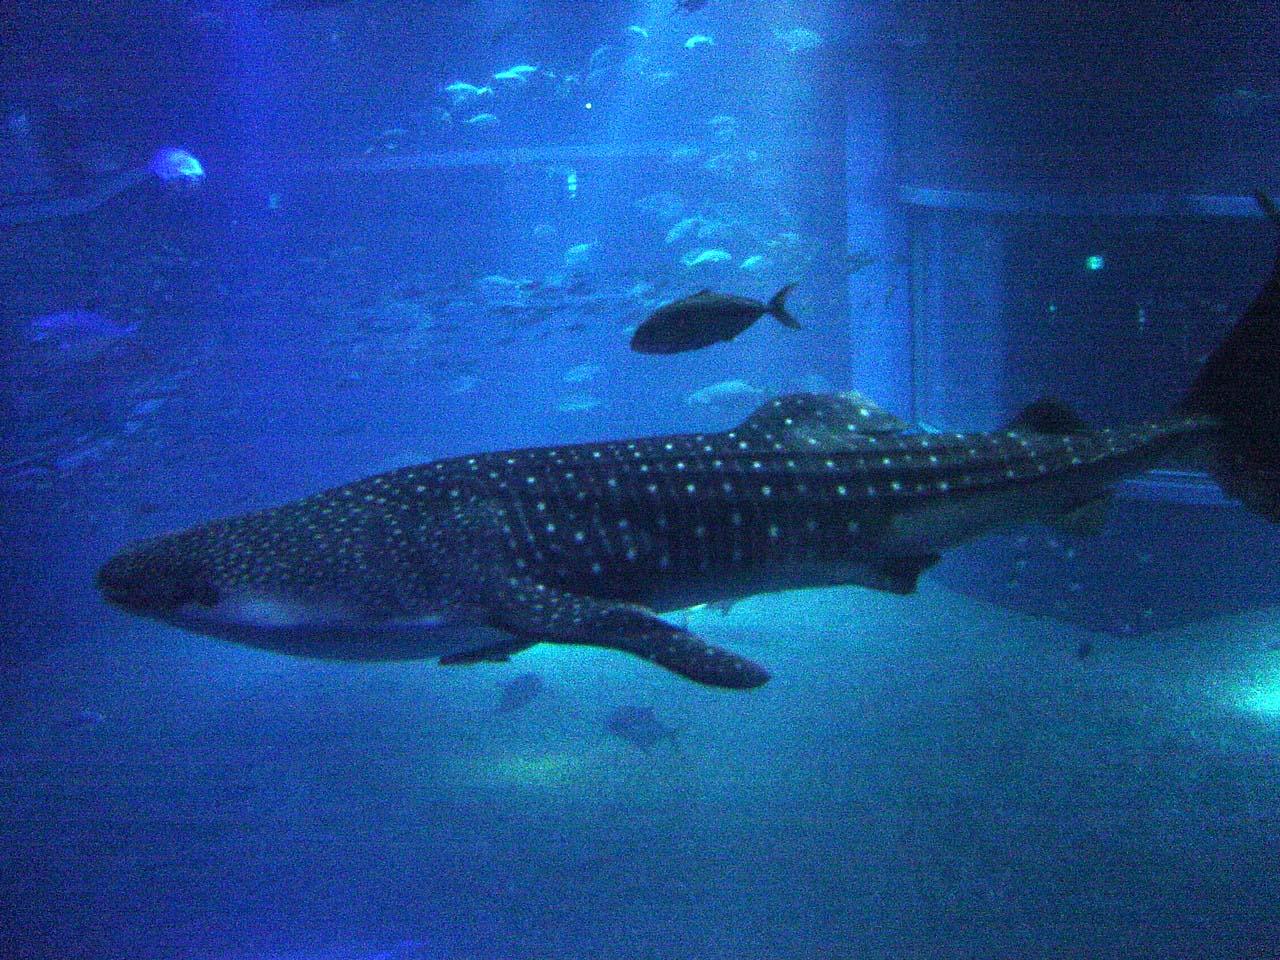 Aquarium Sharks : File:Whale Shark at Osaka Aquarium.jpg - Wikimedia Commons